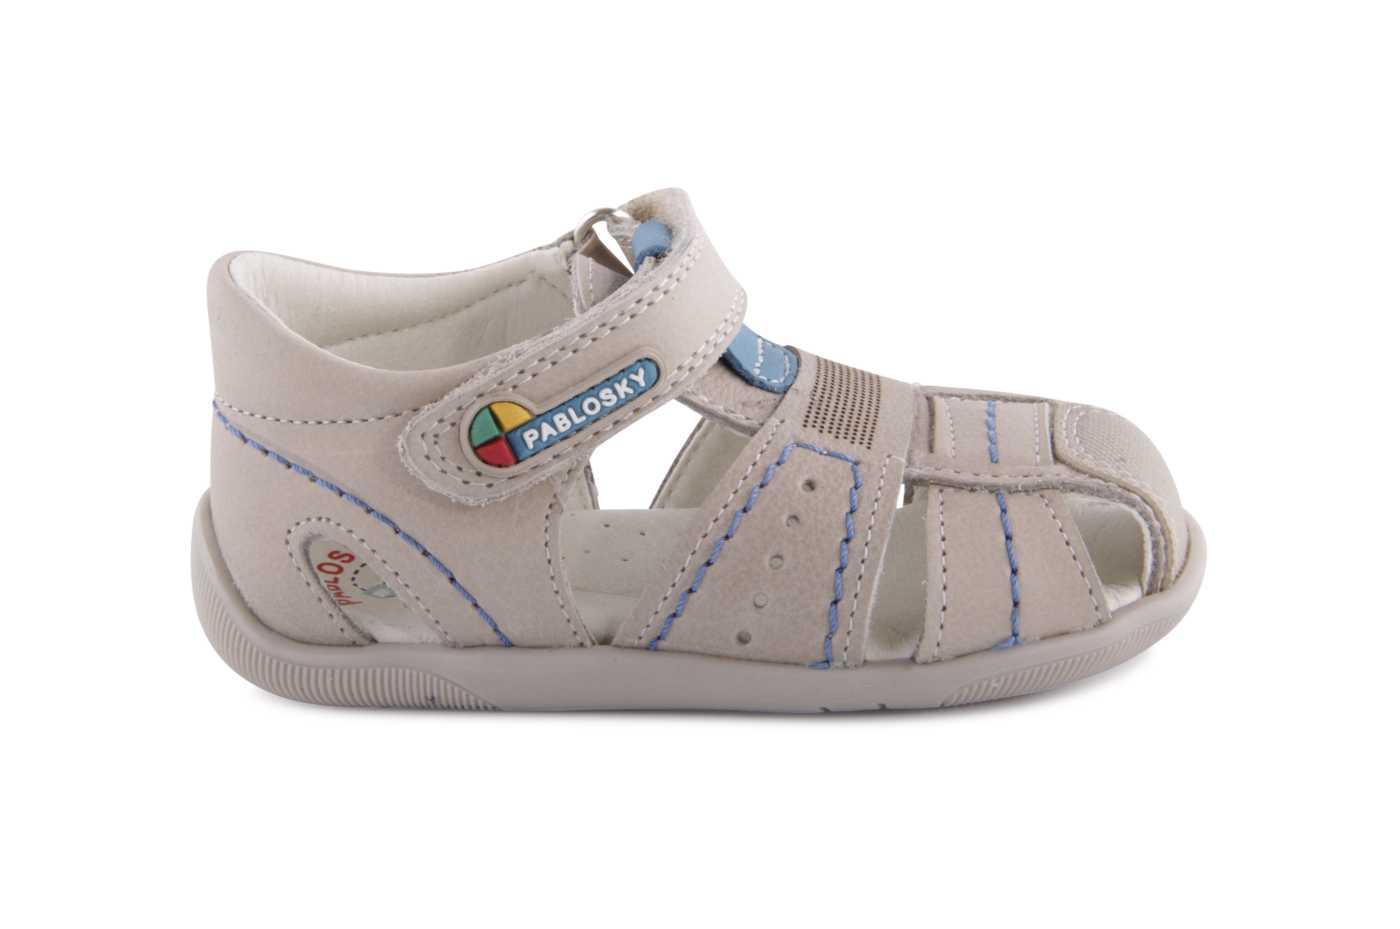 77c9b9b20 Comprar zapato tipo PREANDANTE NIÑO estilo SANDALIA COLOR BEIGE PIEL ...